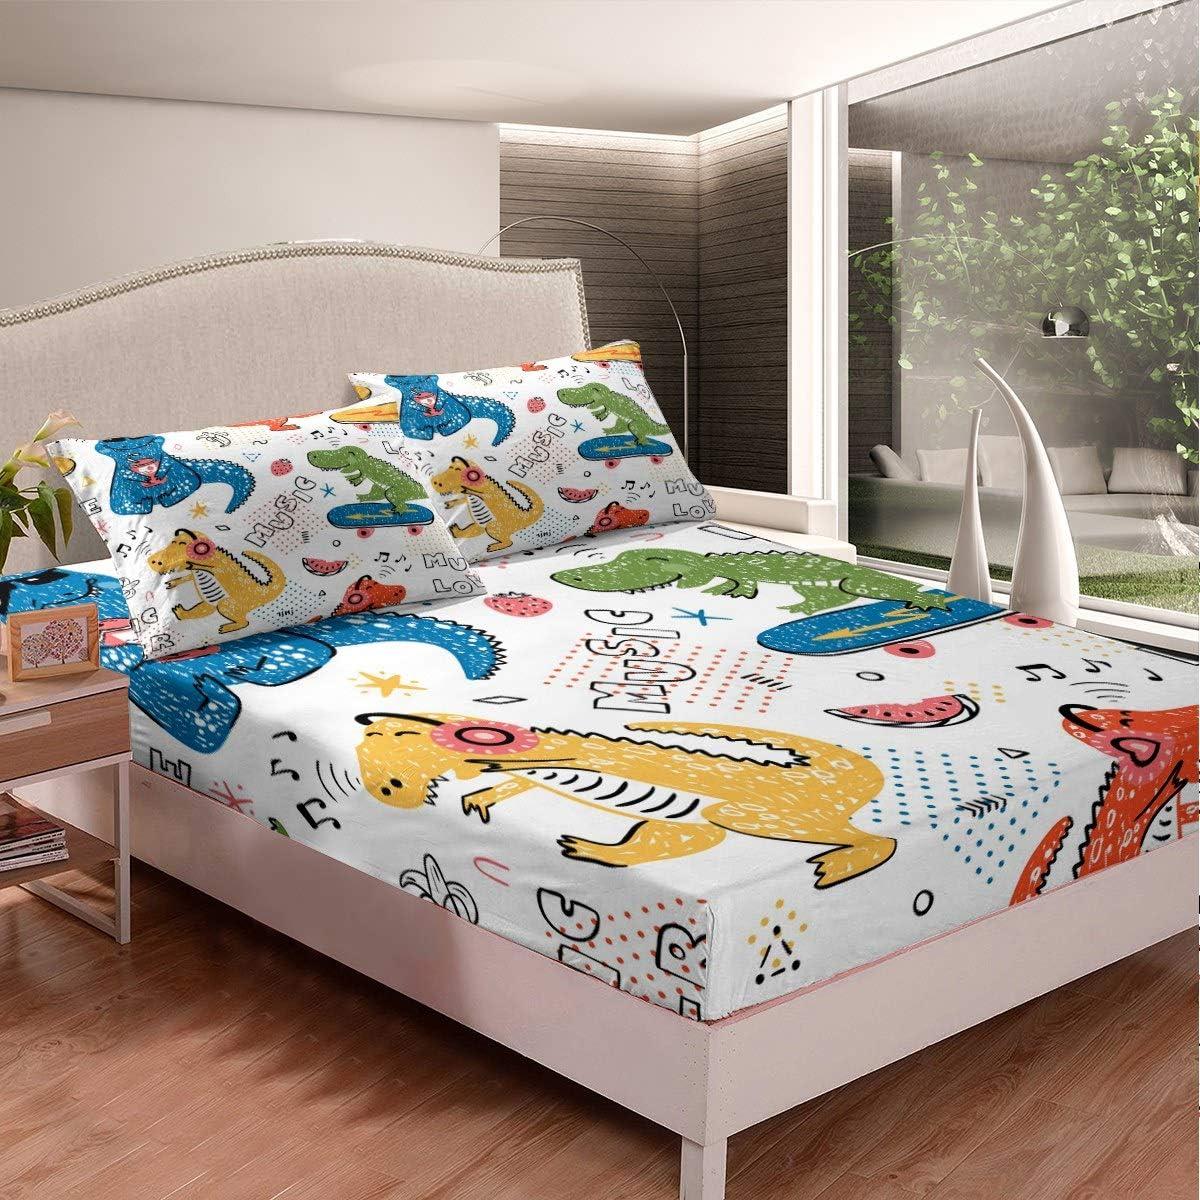 Feelyou Dinosaur Fitted Sheet for 販売期間 限定のお得なタイムセール 定価の67%OFF Boys Kids Cartoon Girls Animal